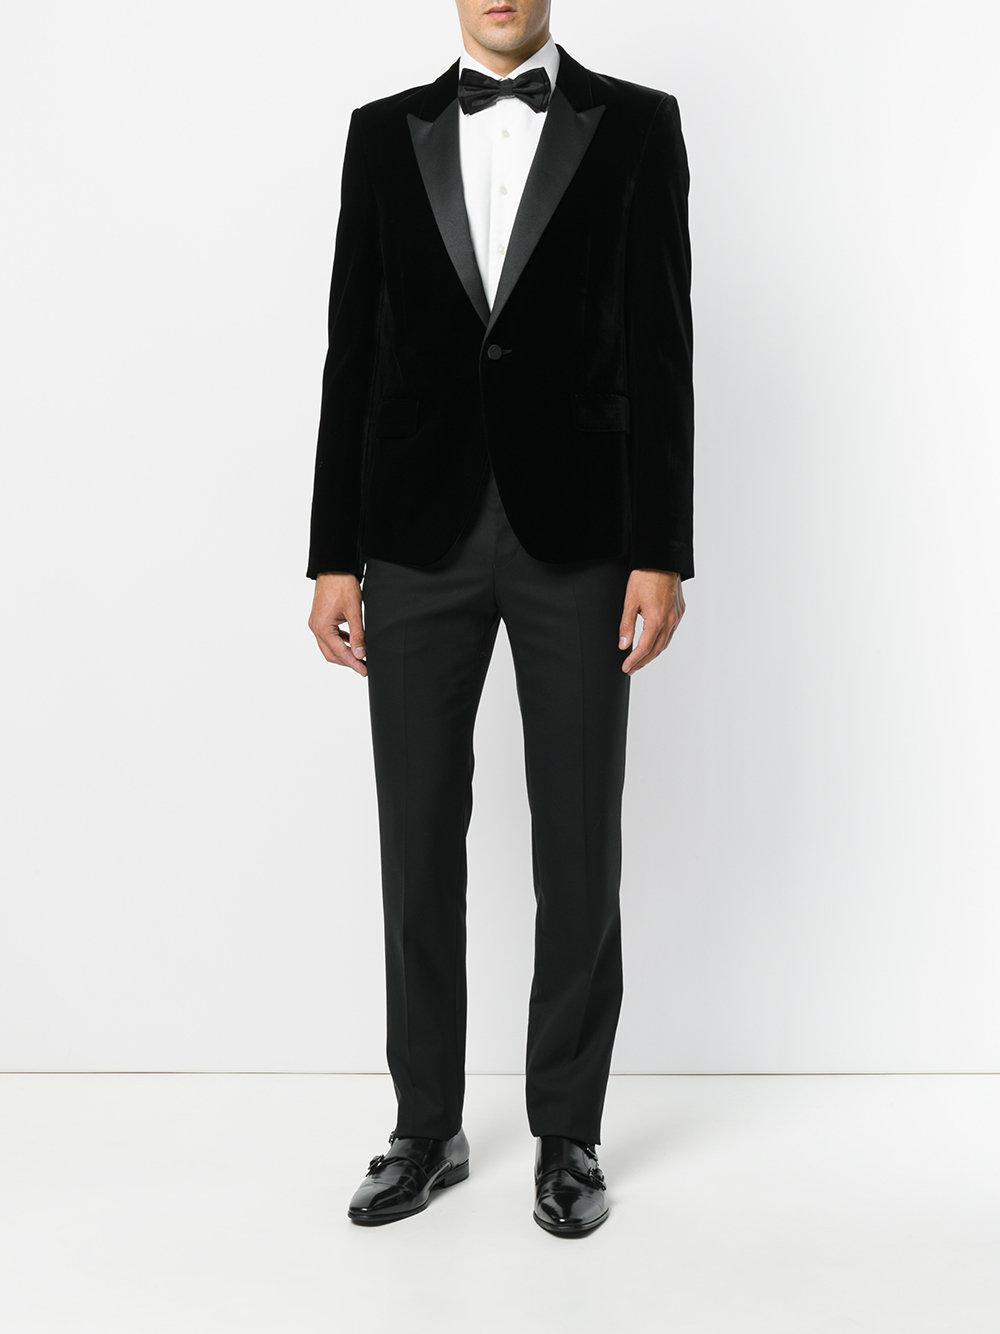 bda2459372a Saint Laurent Black Iconic Le Smoking Jacket for men. View fullscreen